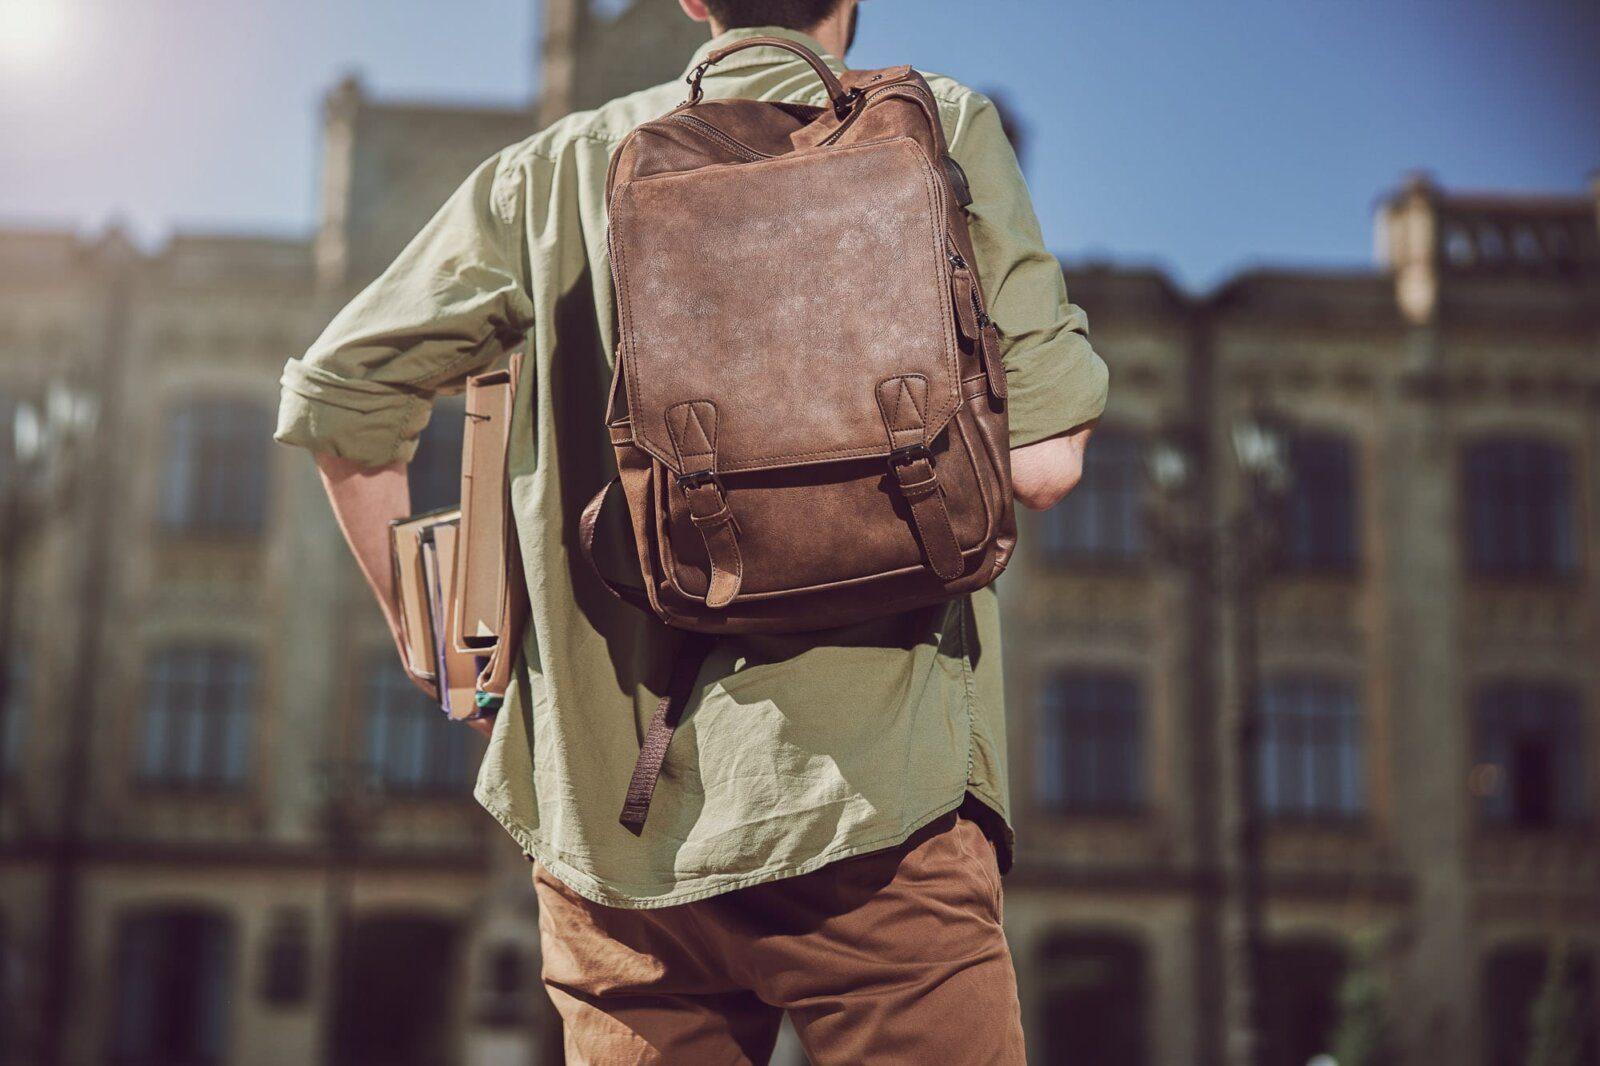 Man with racksack